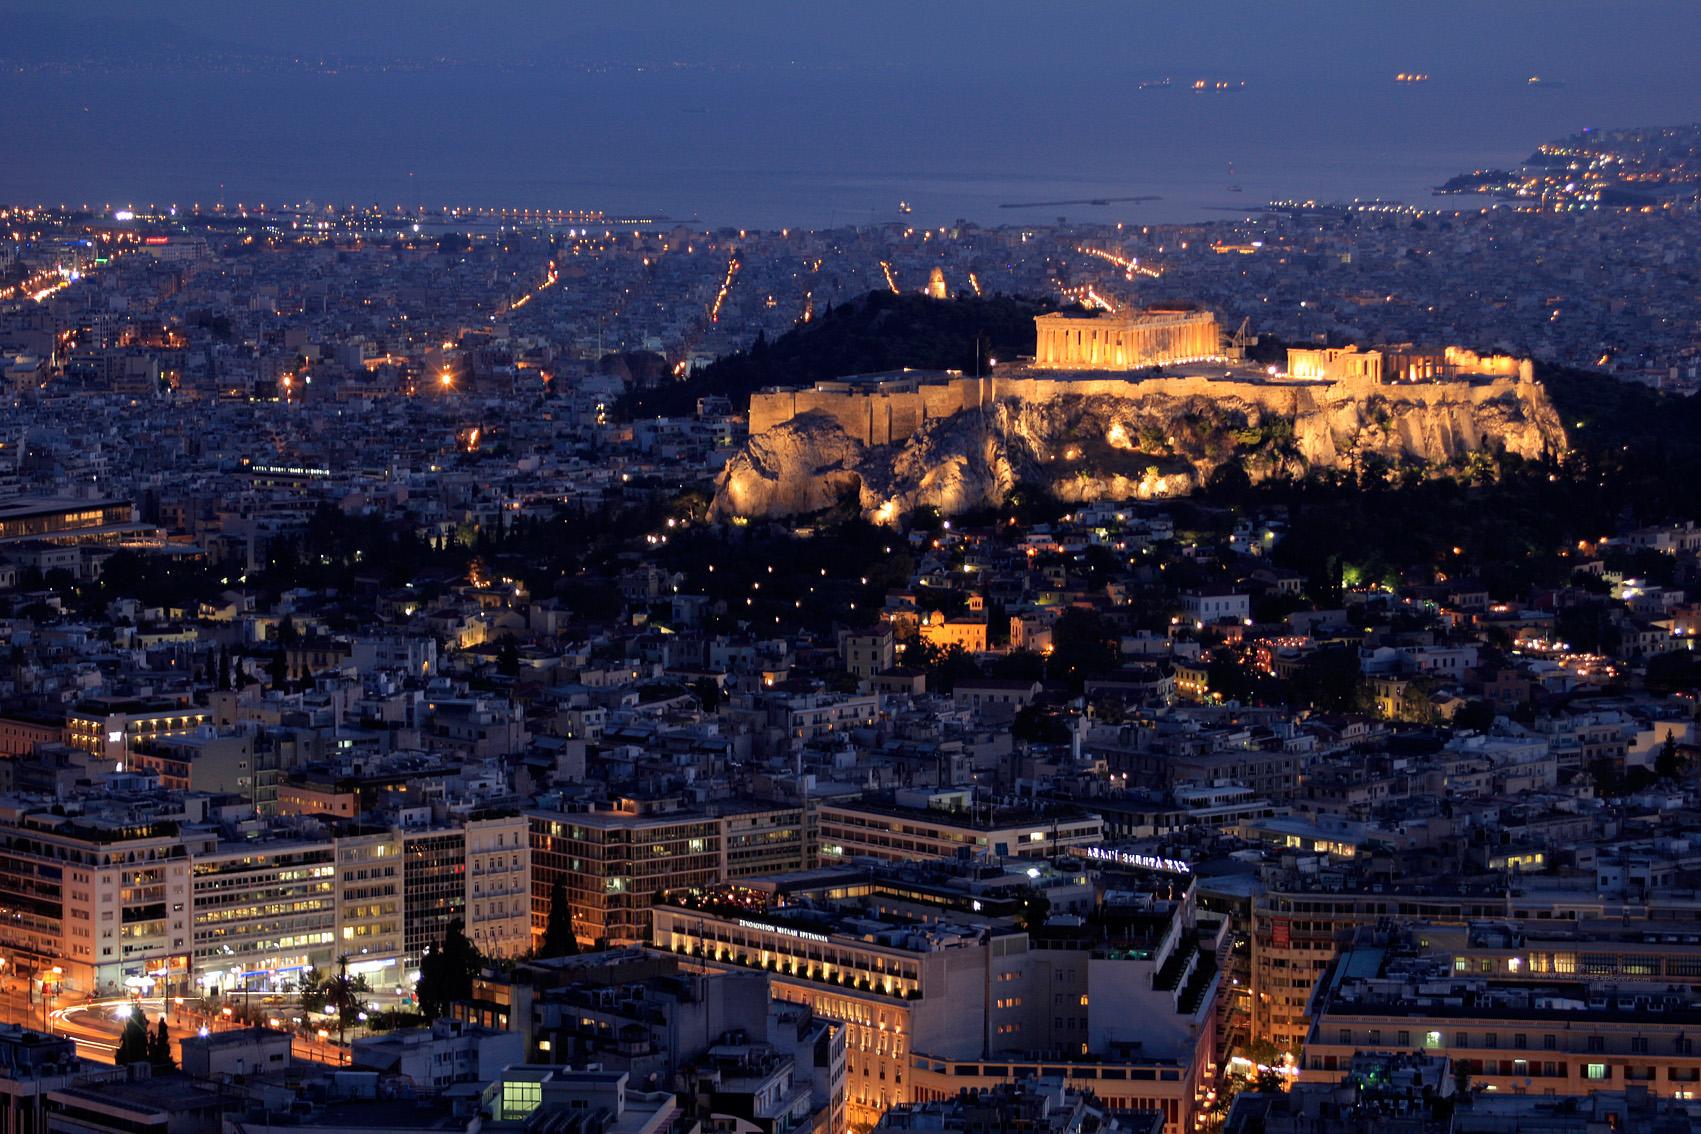 Athens Wallpapers High Resolution MAU2686   4USkY 1701x1134